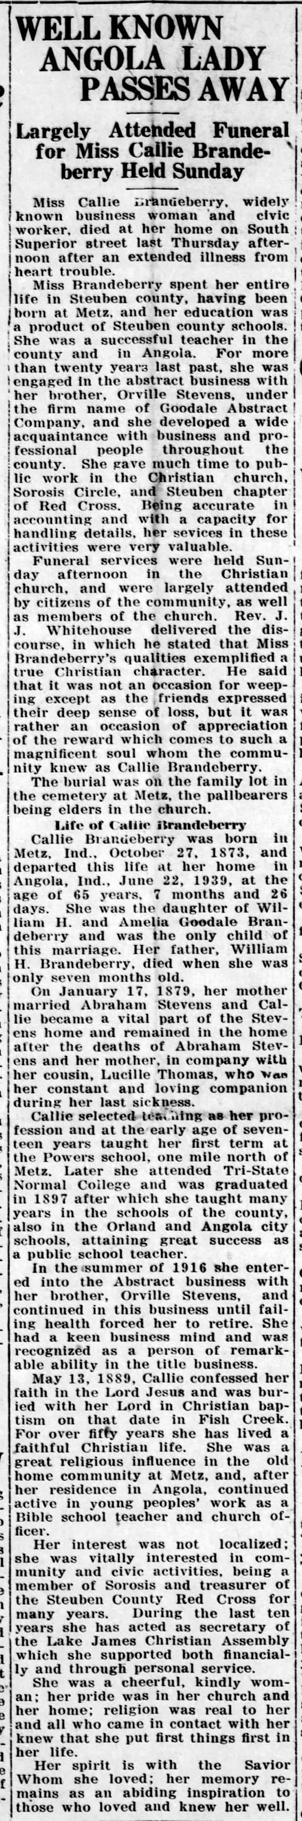 1939 Jun 30 BRANDEBERRY Callie OBIT Angola Herald IN